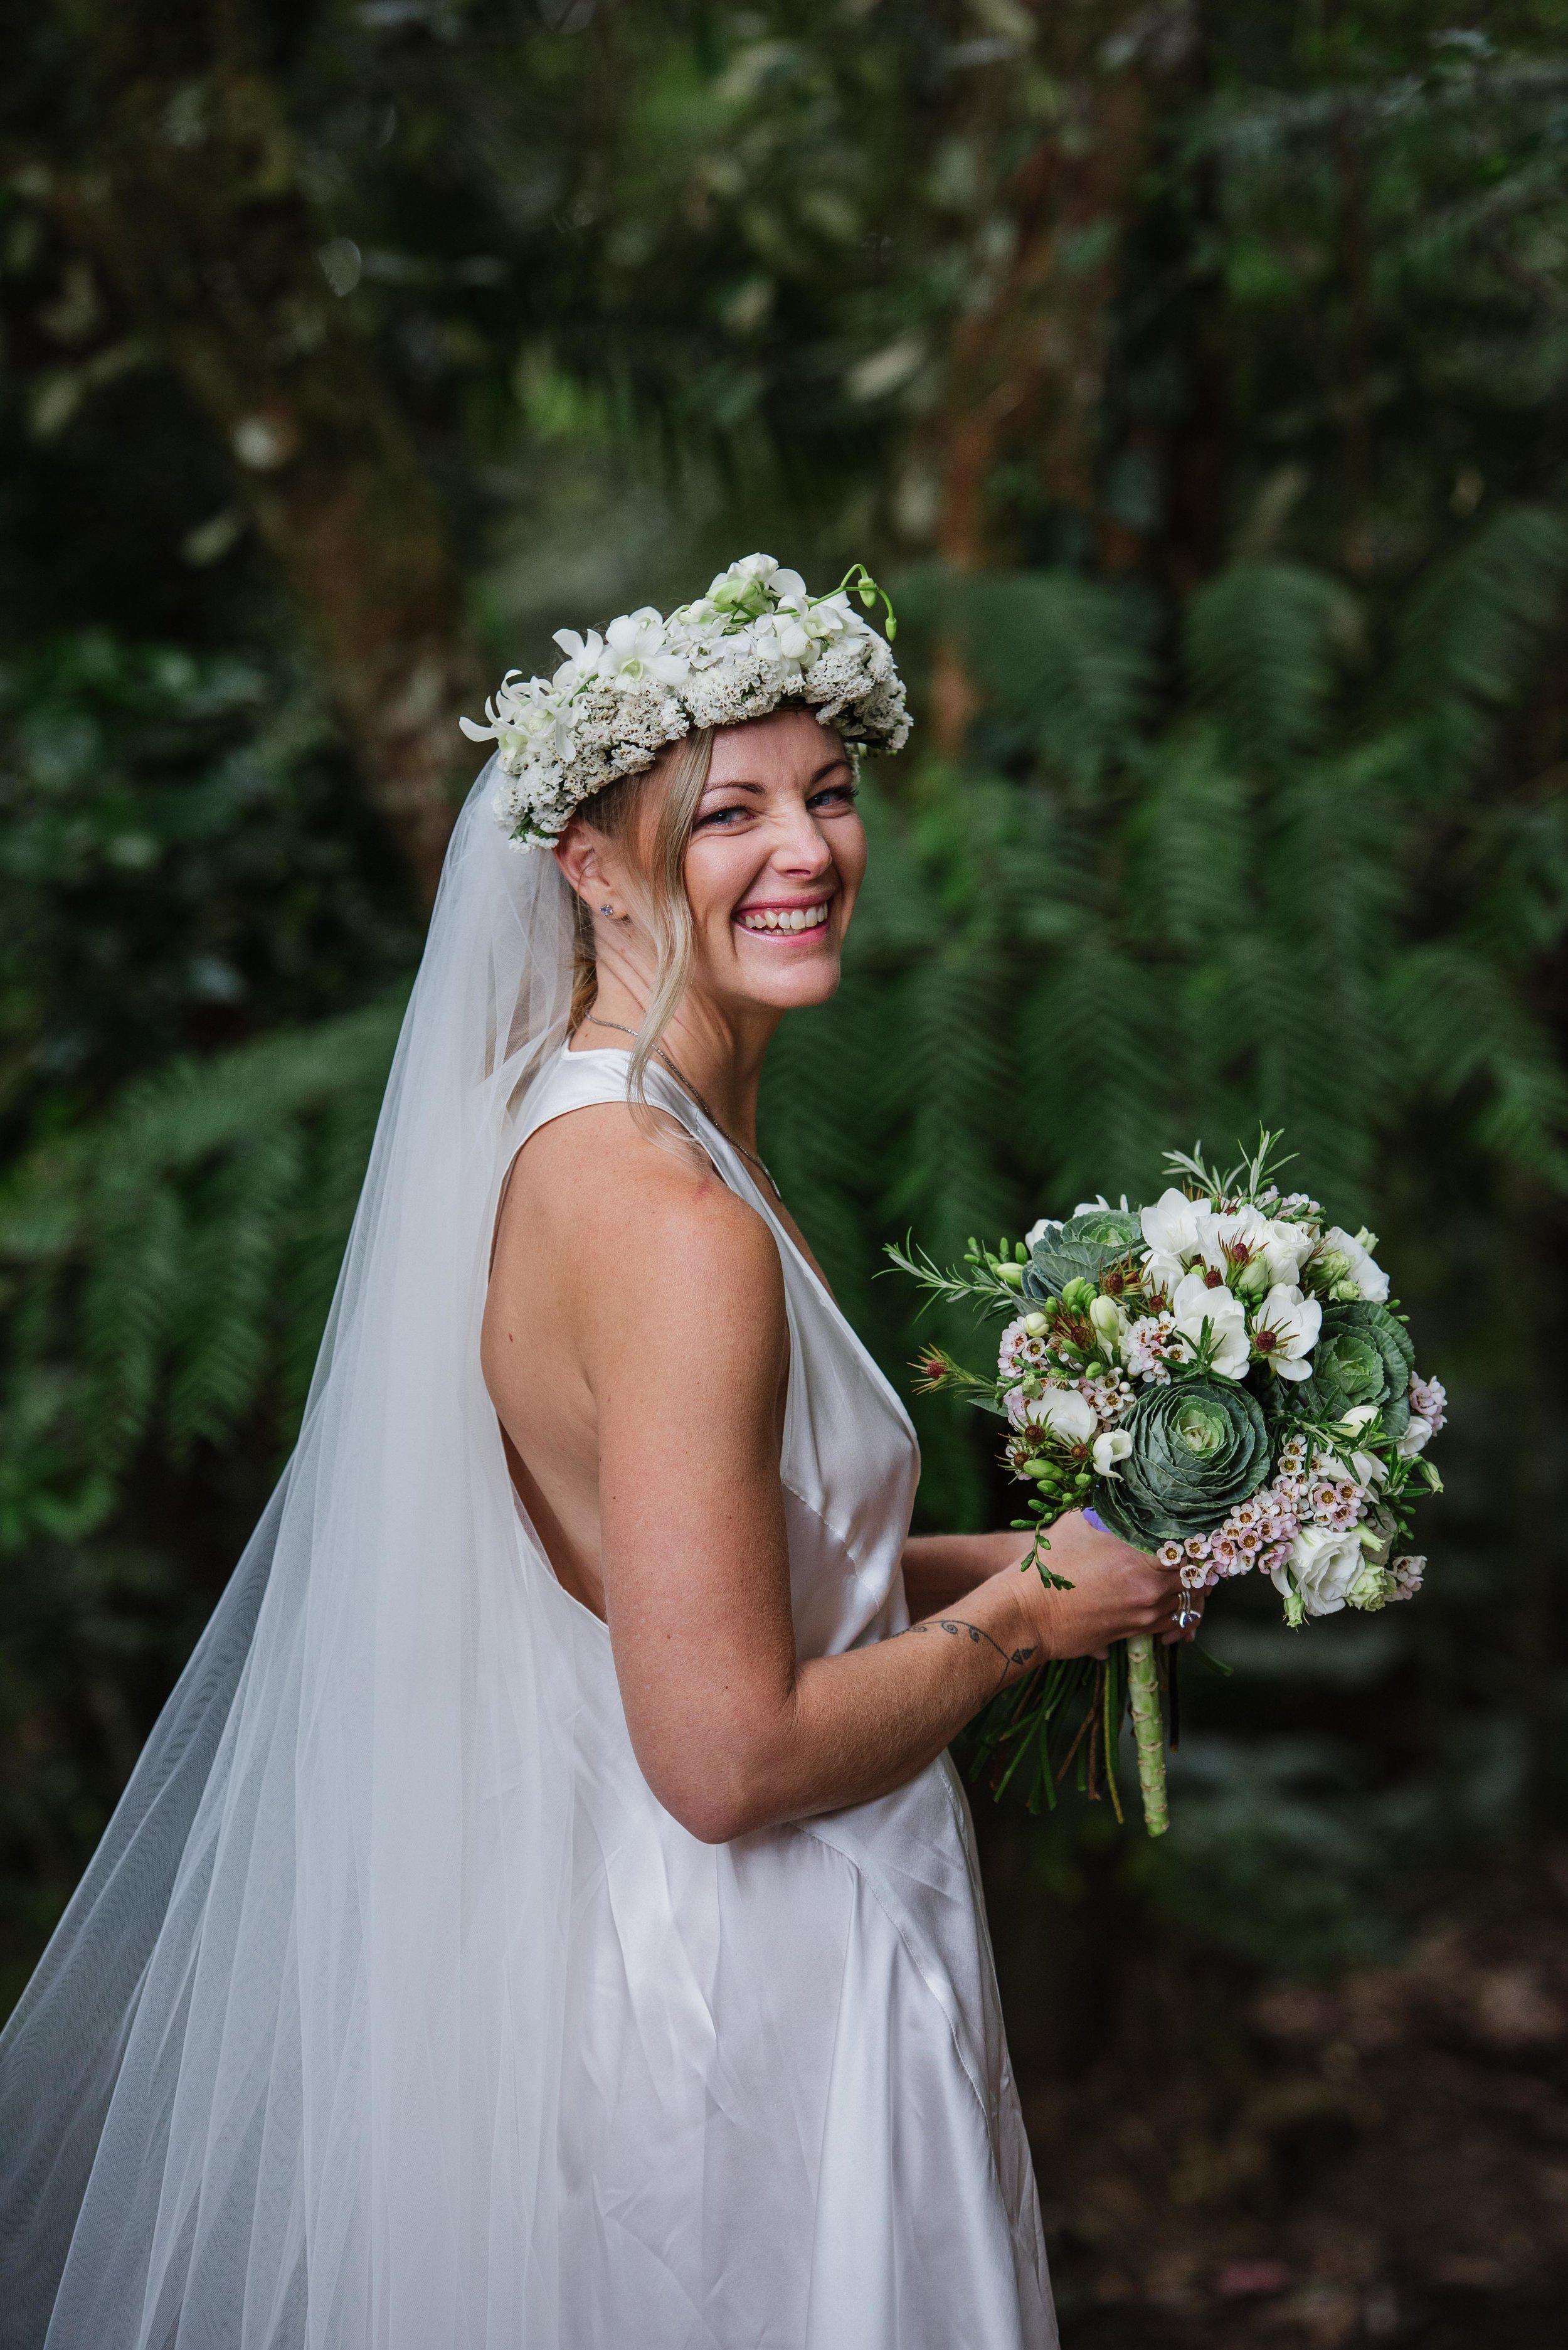 Carla and Luke- wedding photographer, byron bay wedding and family photographer, tweed heads wedding and family photography-132.jpg